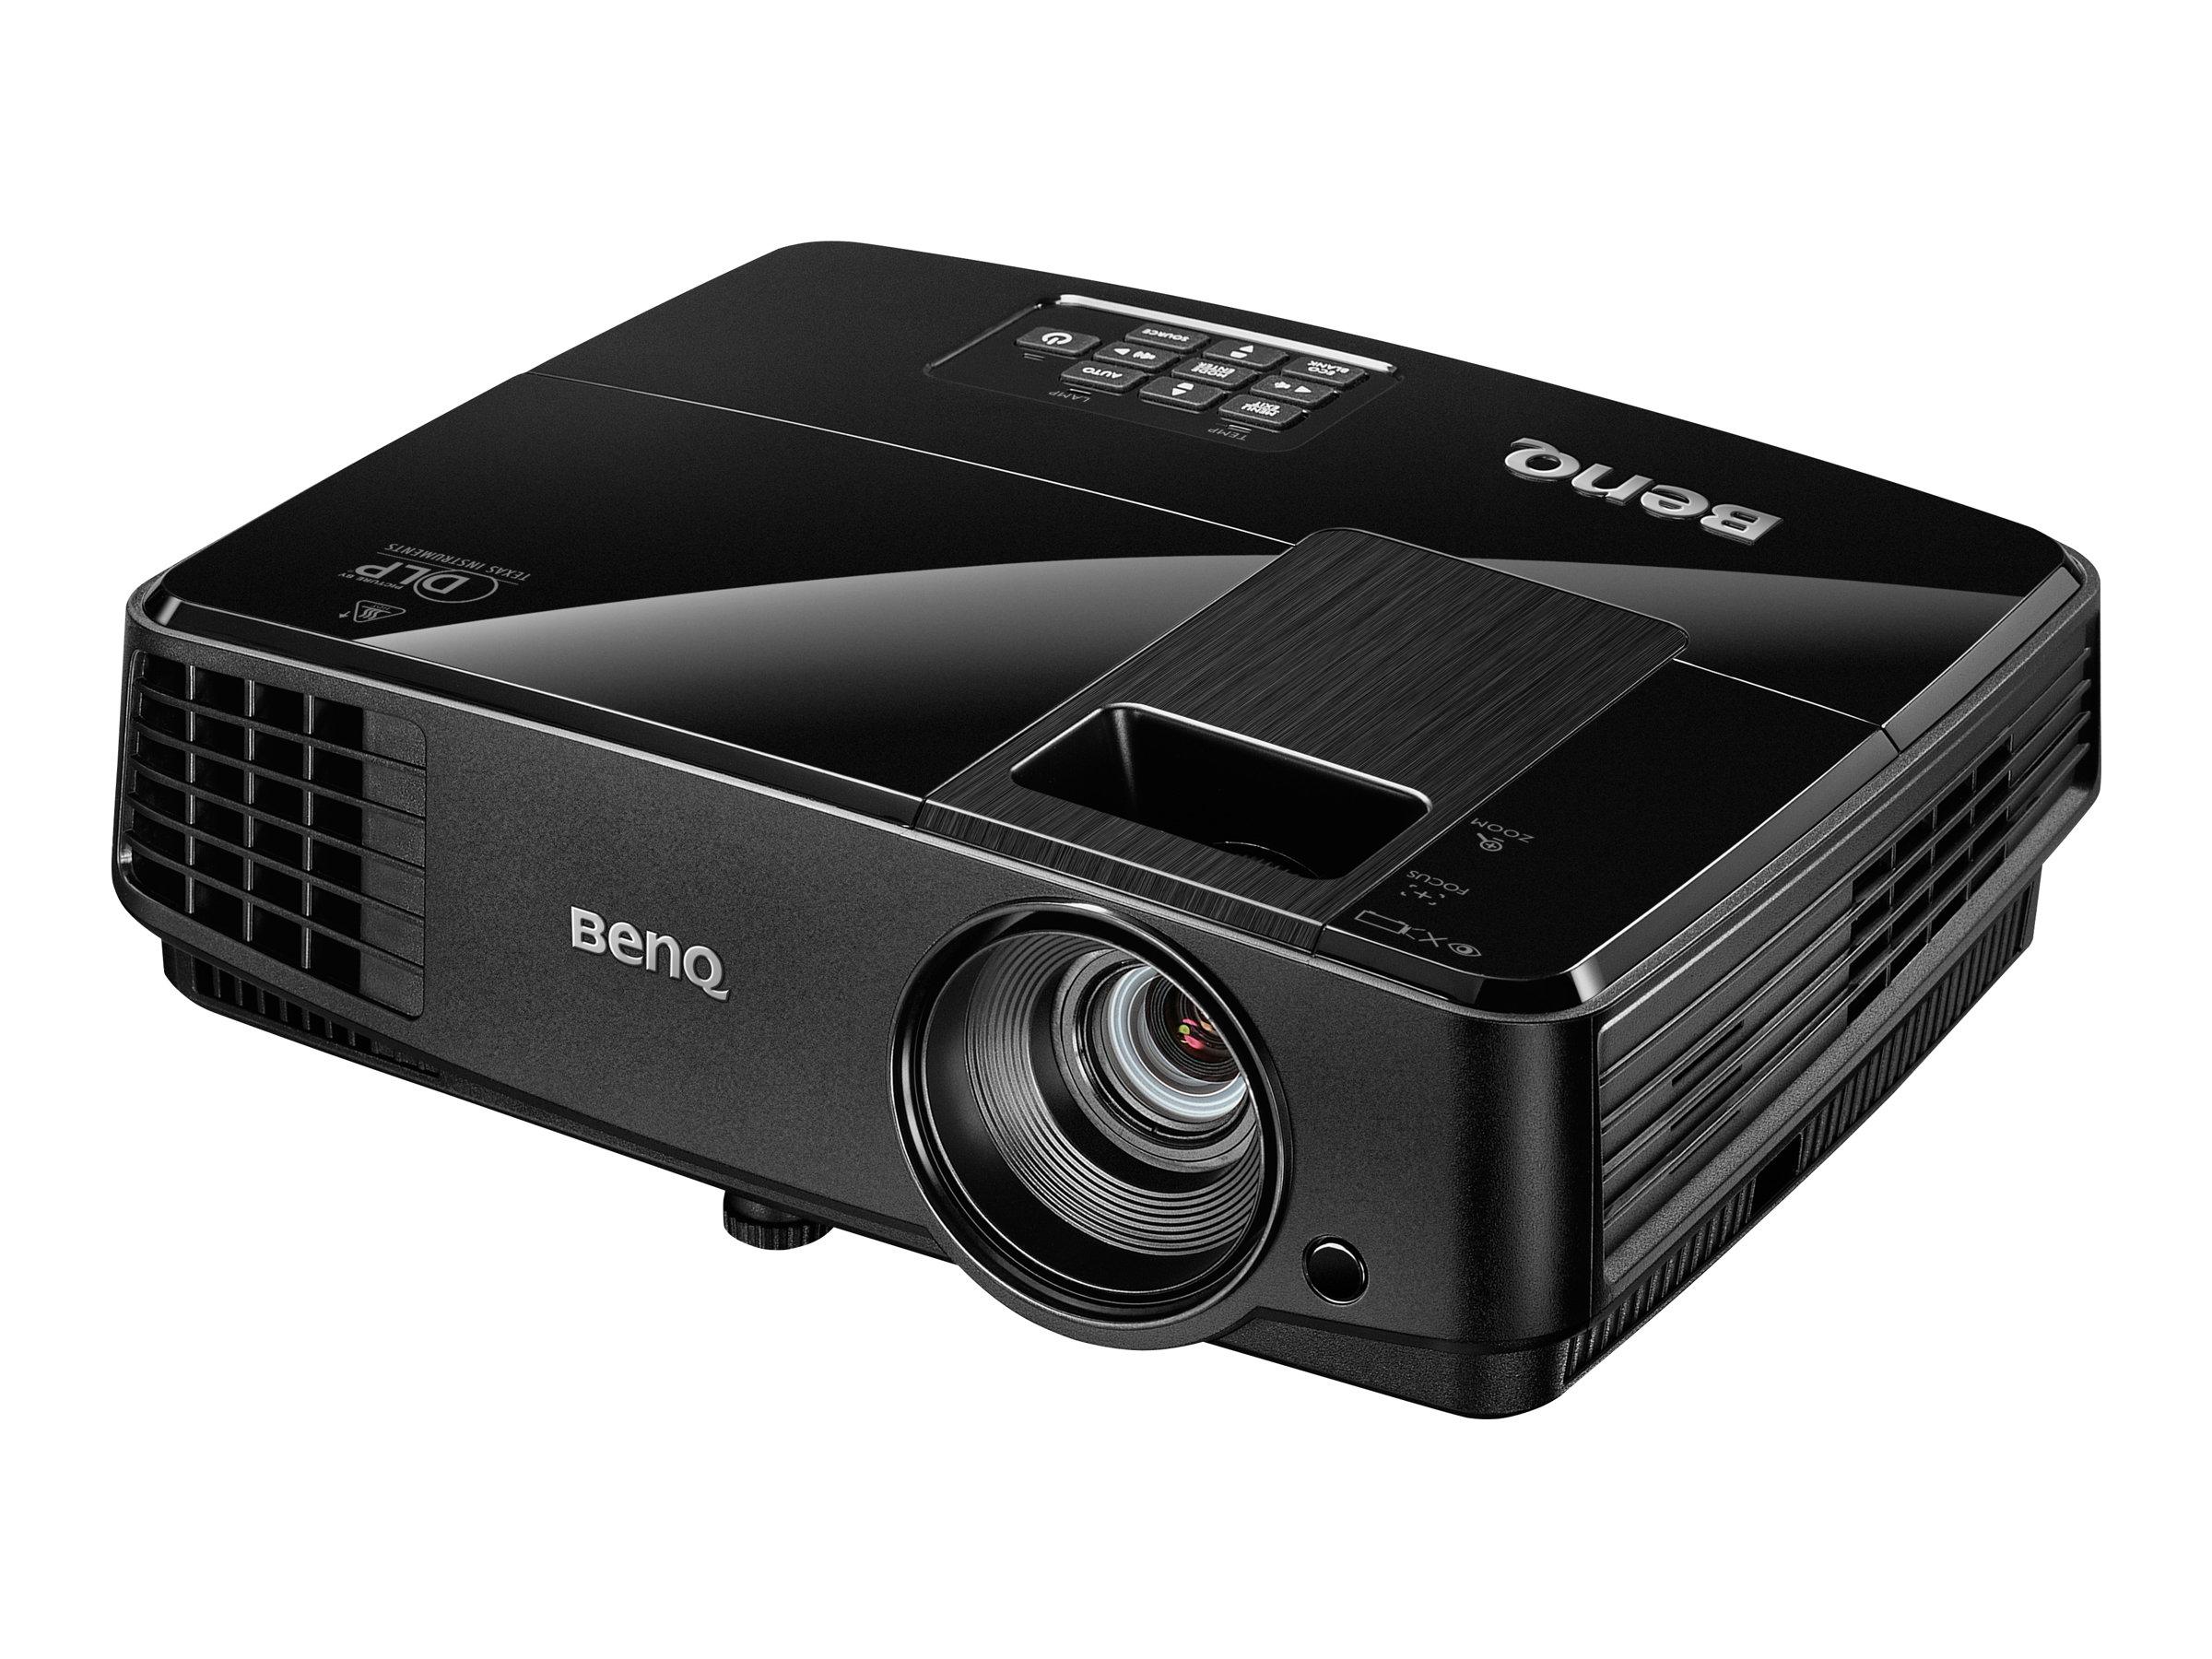 BenQ MS504 - DLP-Projektor - tragbar - 3000 ANSI-Lumen - SVGA (800 x 600) - 4:3